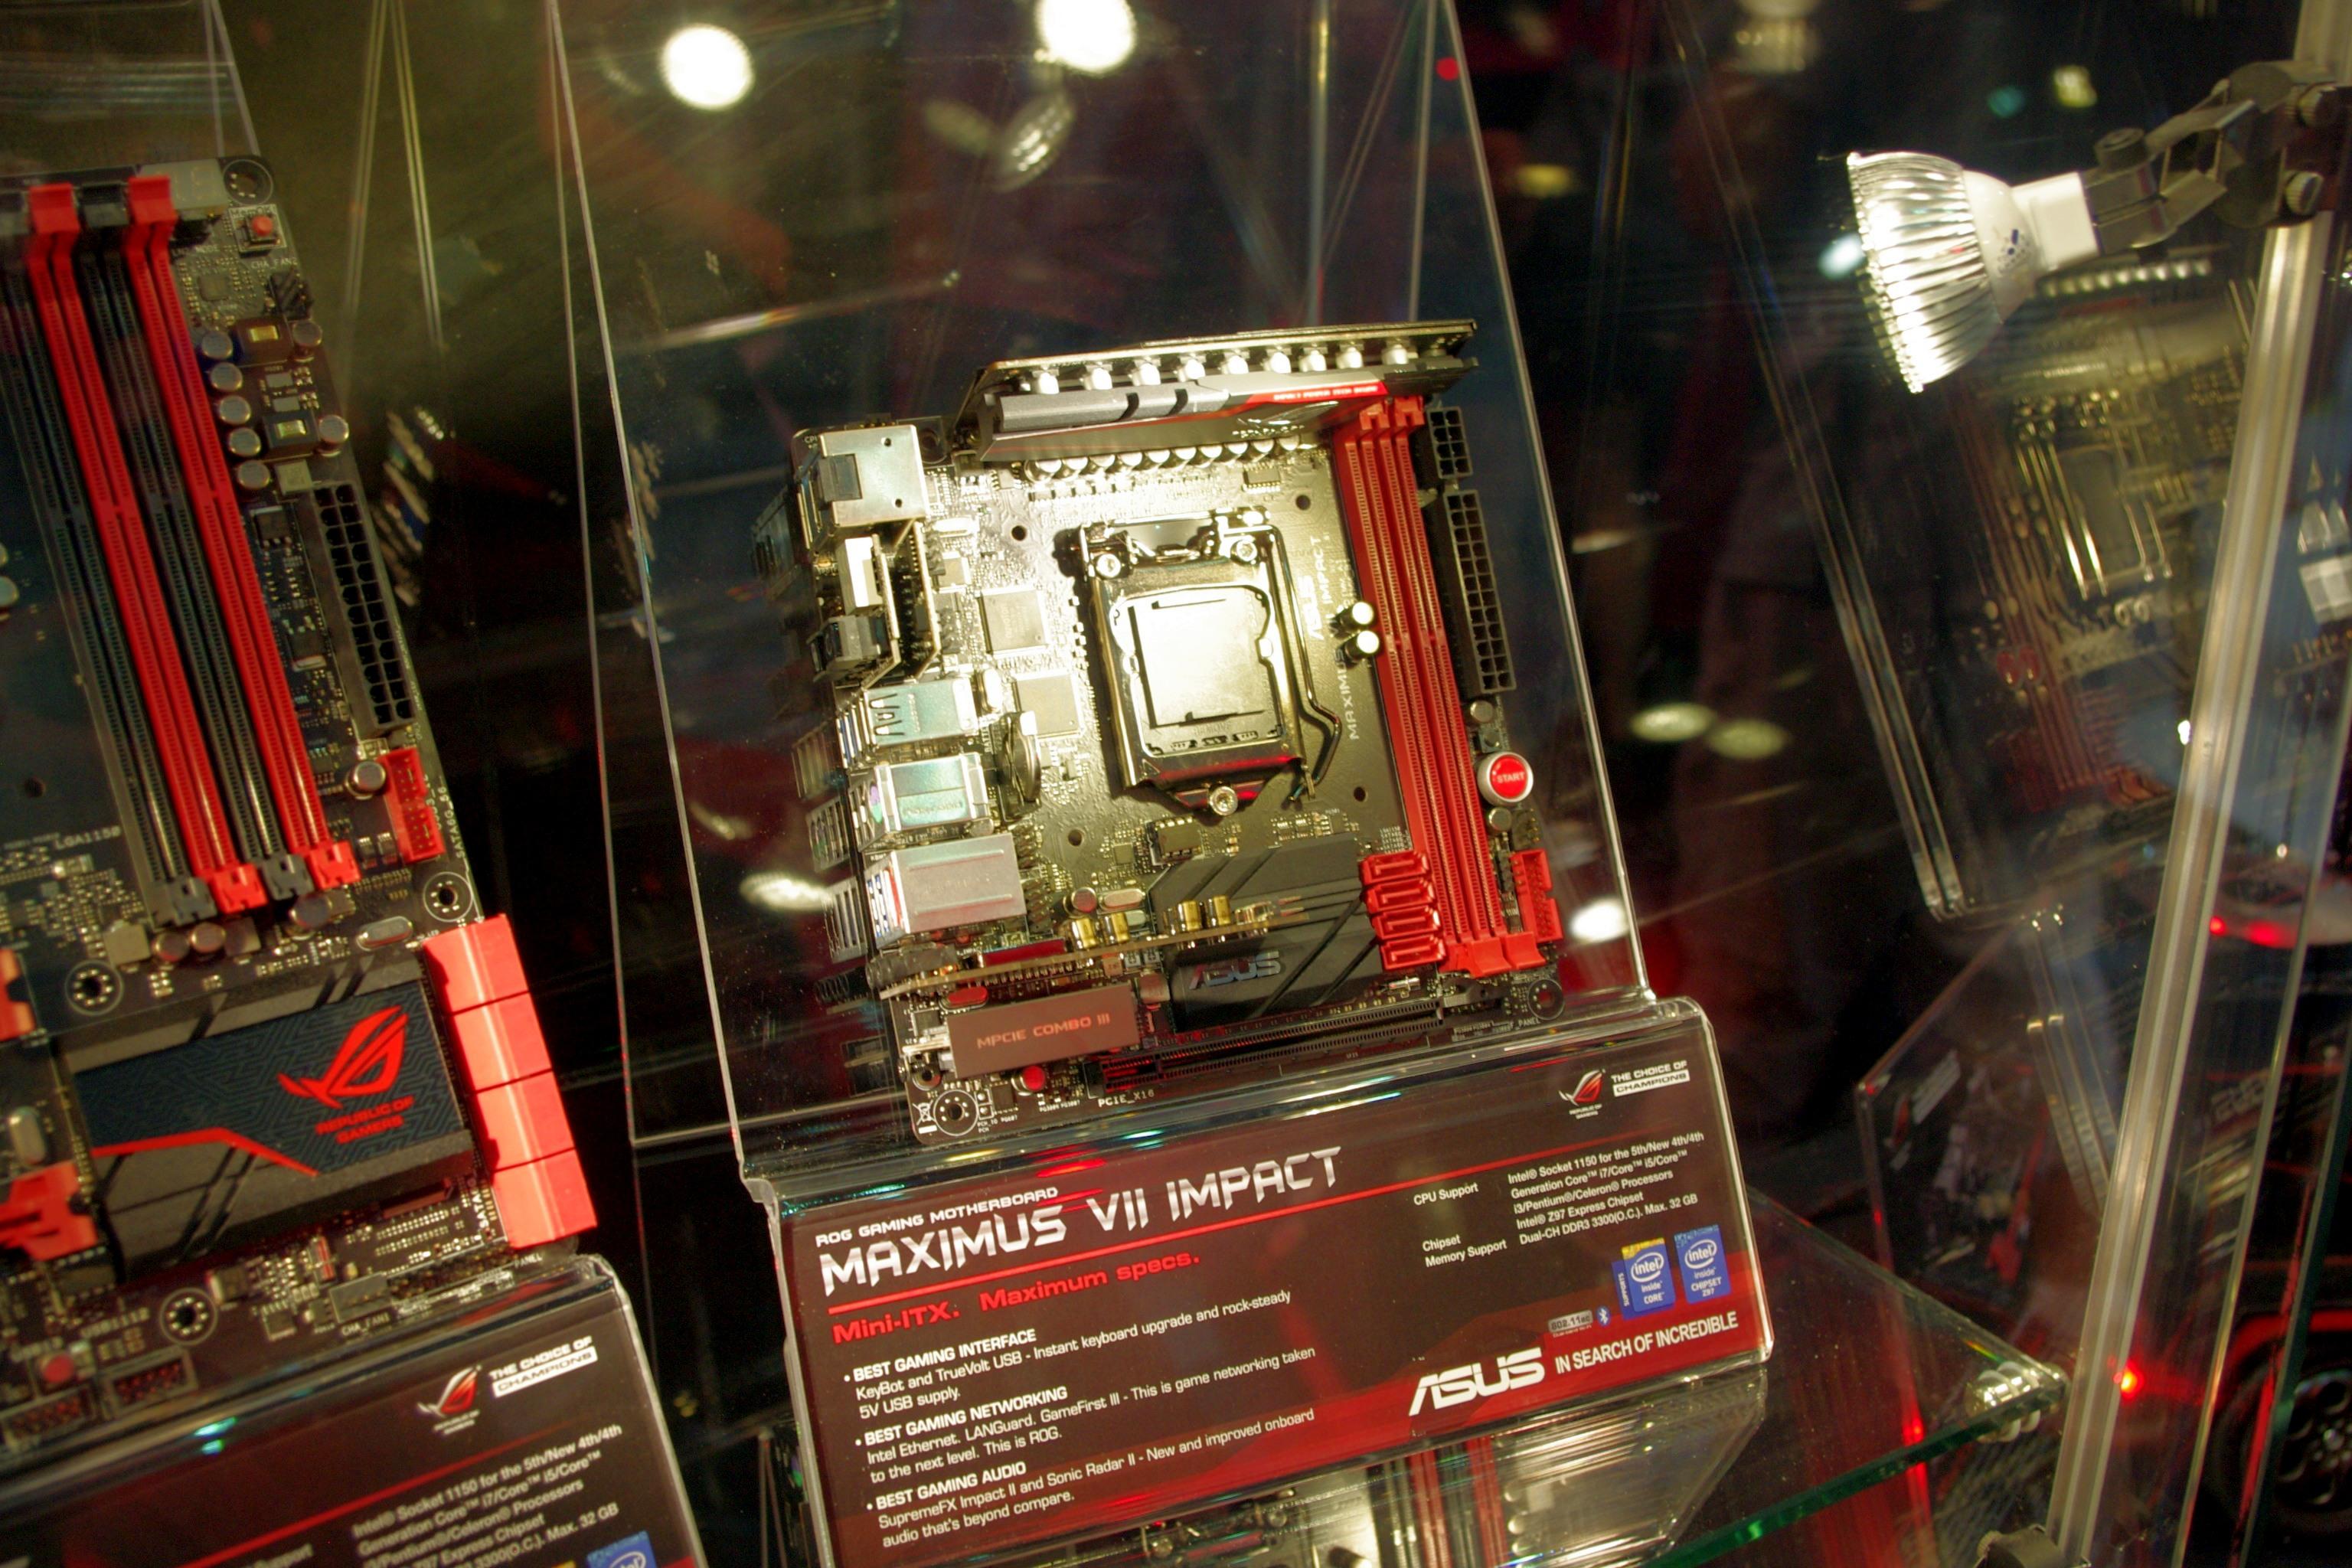 Gaming Motherboards: Impact, Formula, H97-Pro Gamer, the MaxiMini